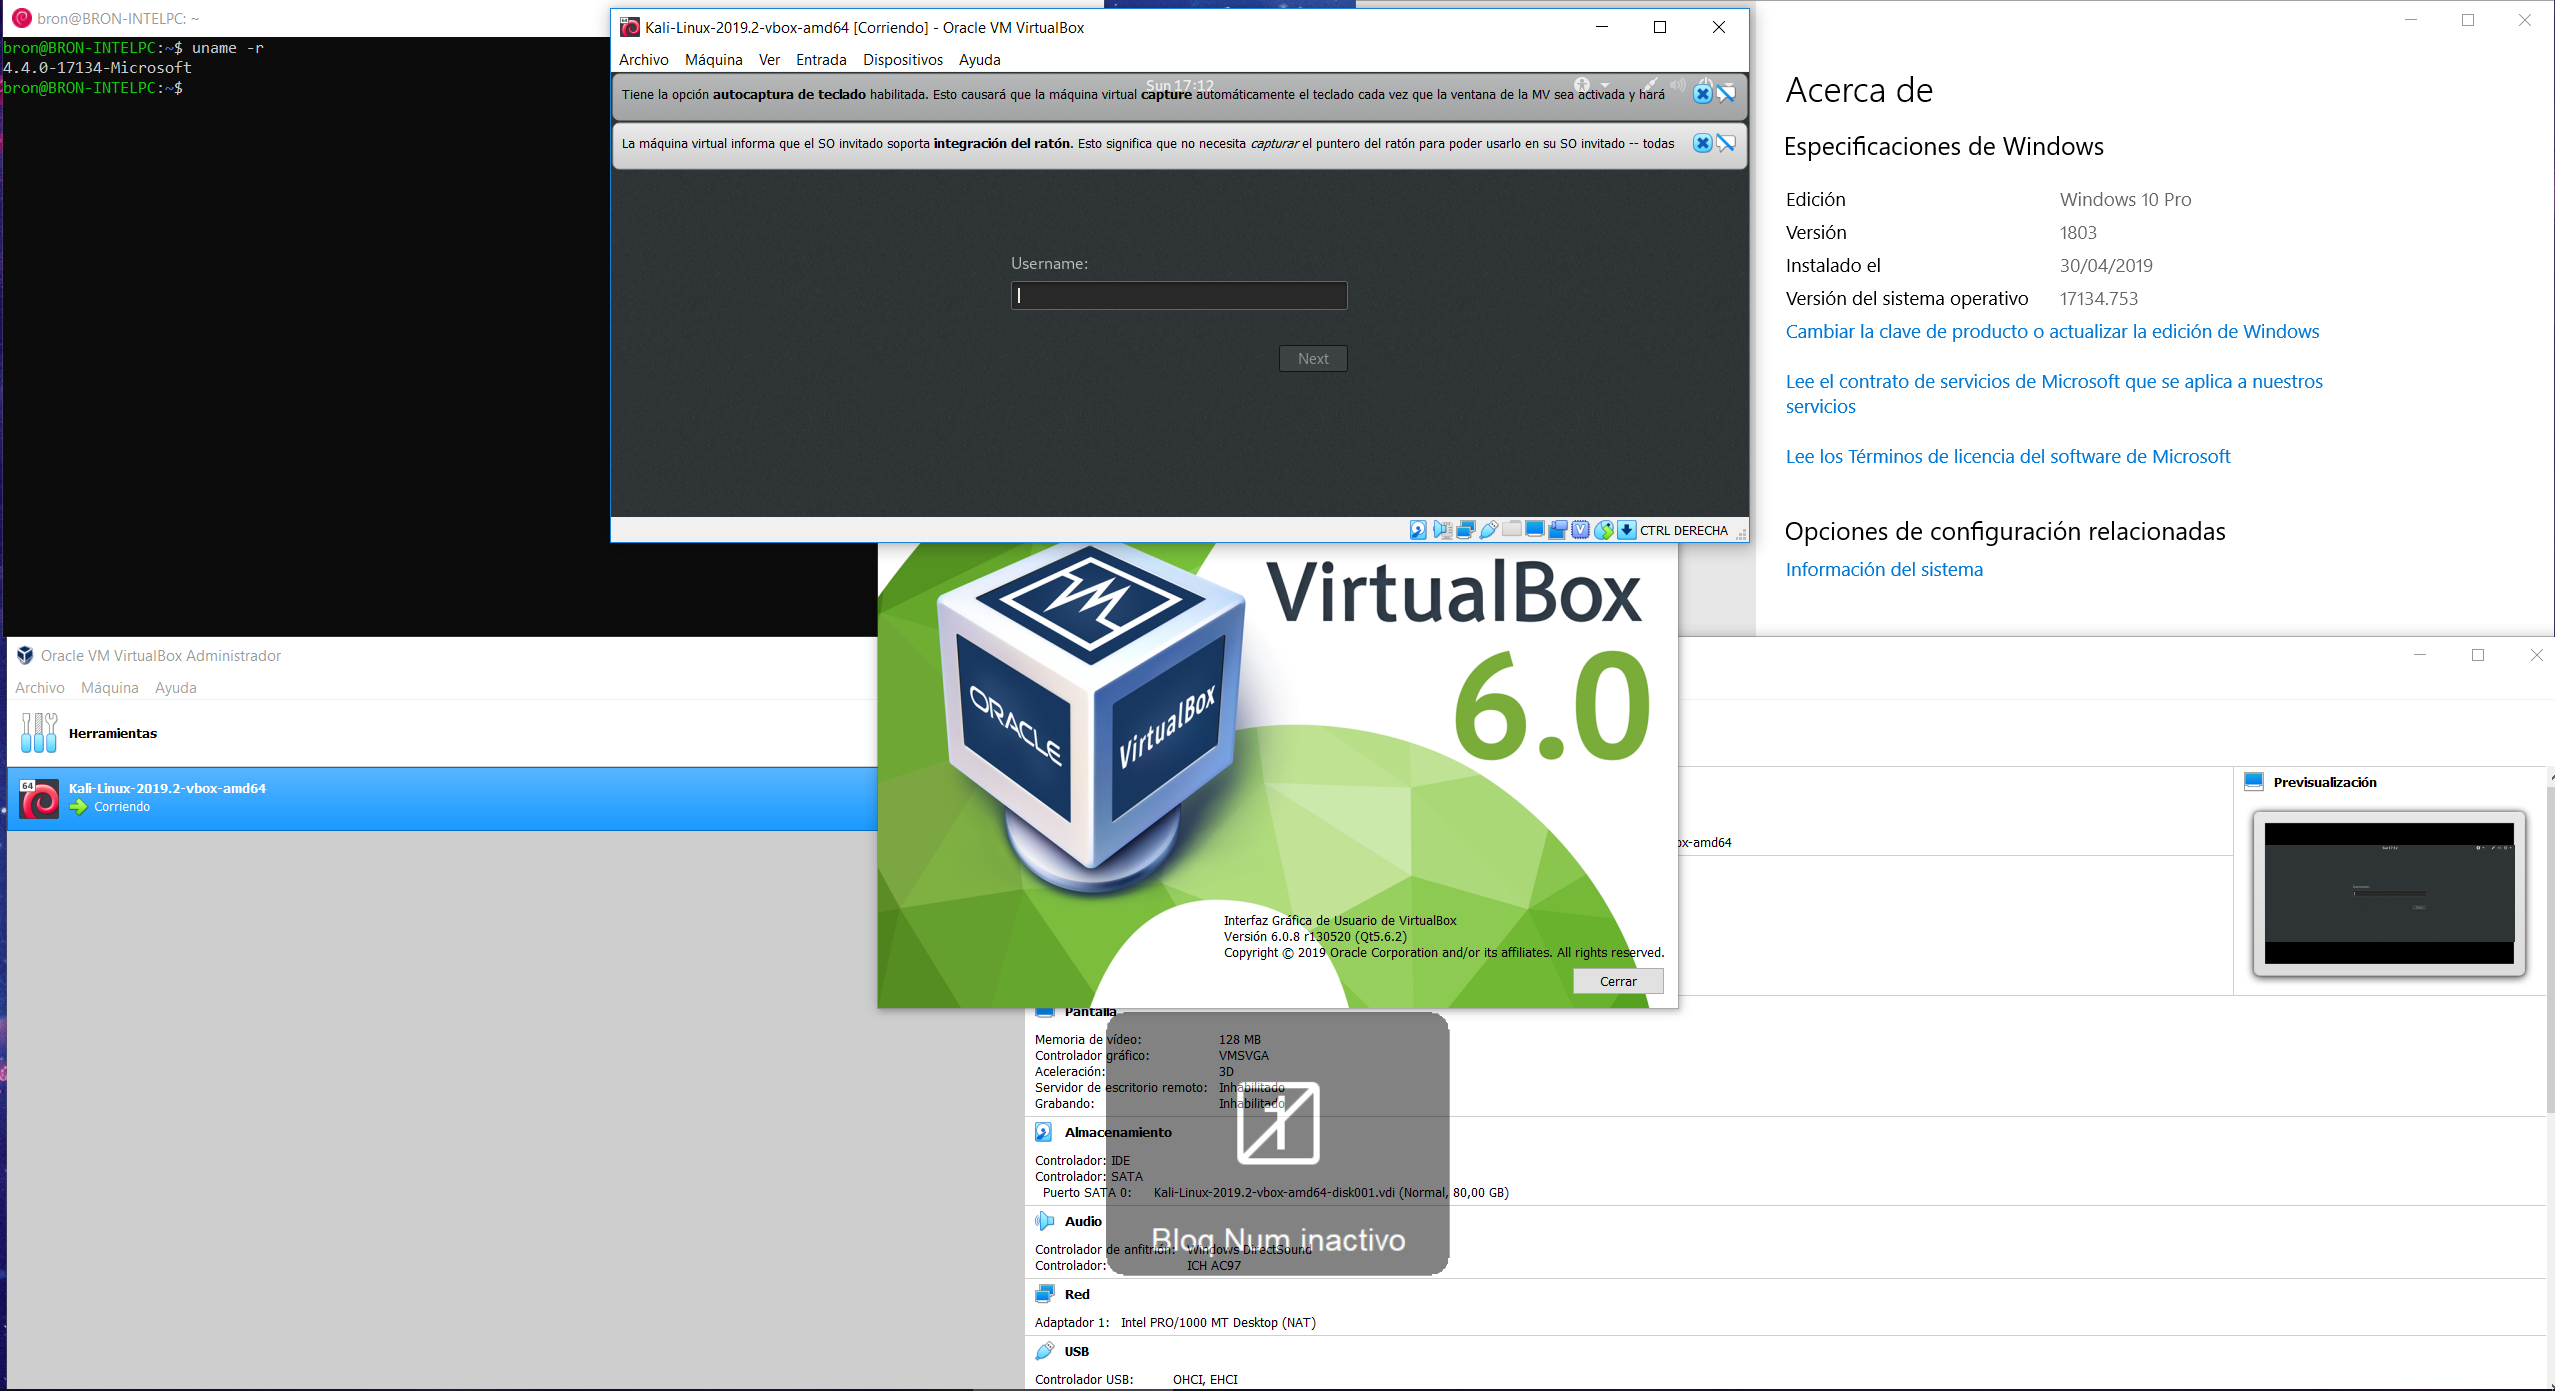 Windows 10 te obliga a elegir entre VirtualBox y Hyper-V